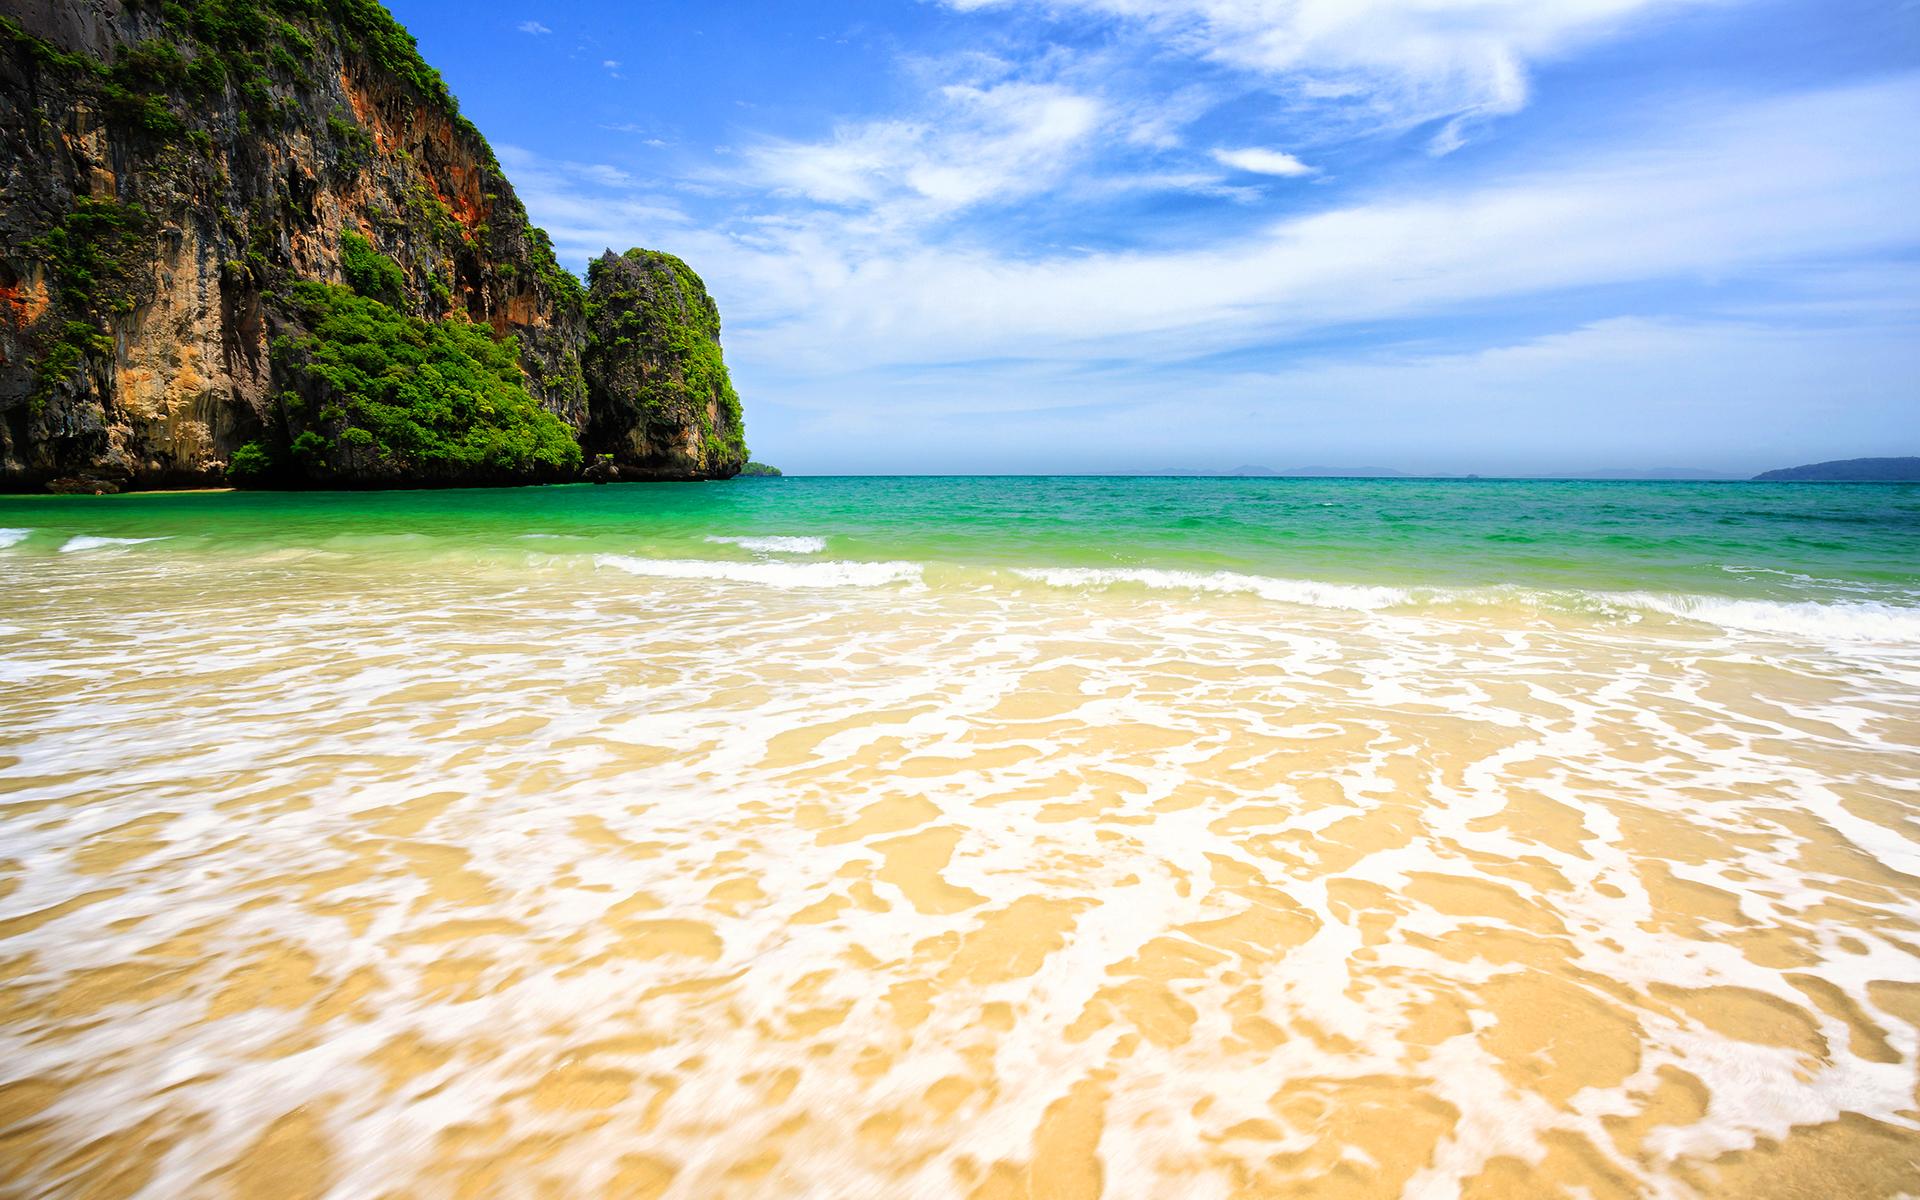 tropical beach paradise   HD Desktop Wallpapers 4k HD 1920x1200